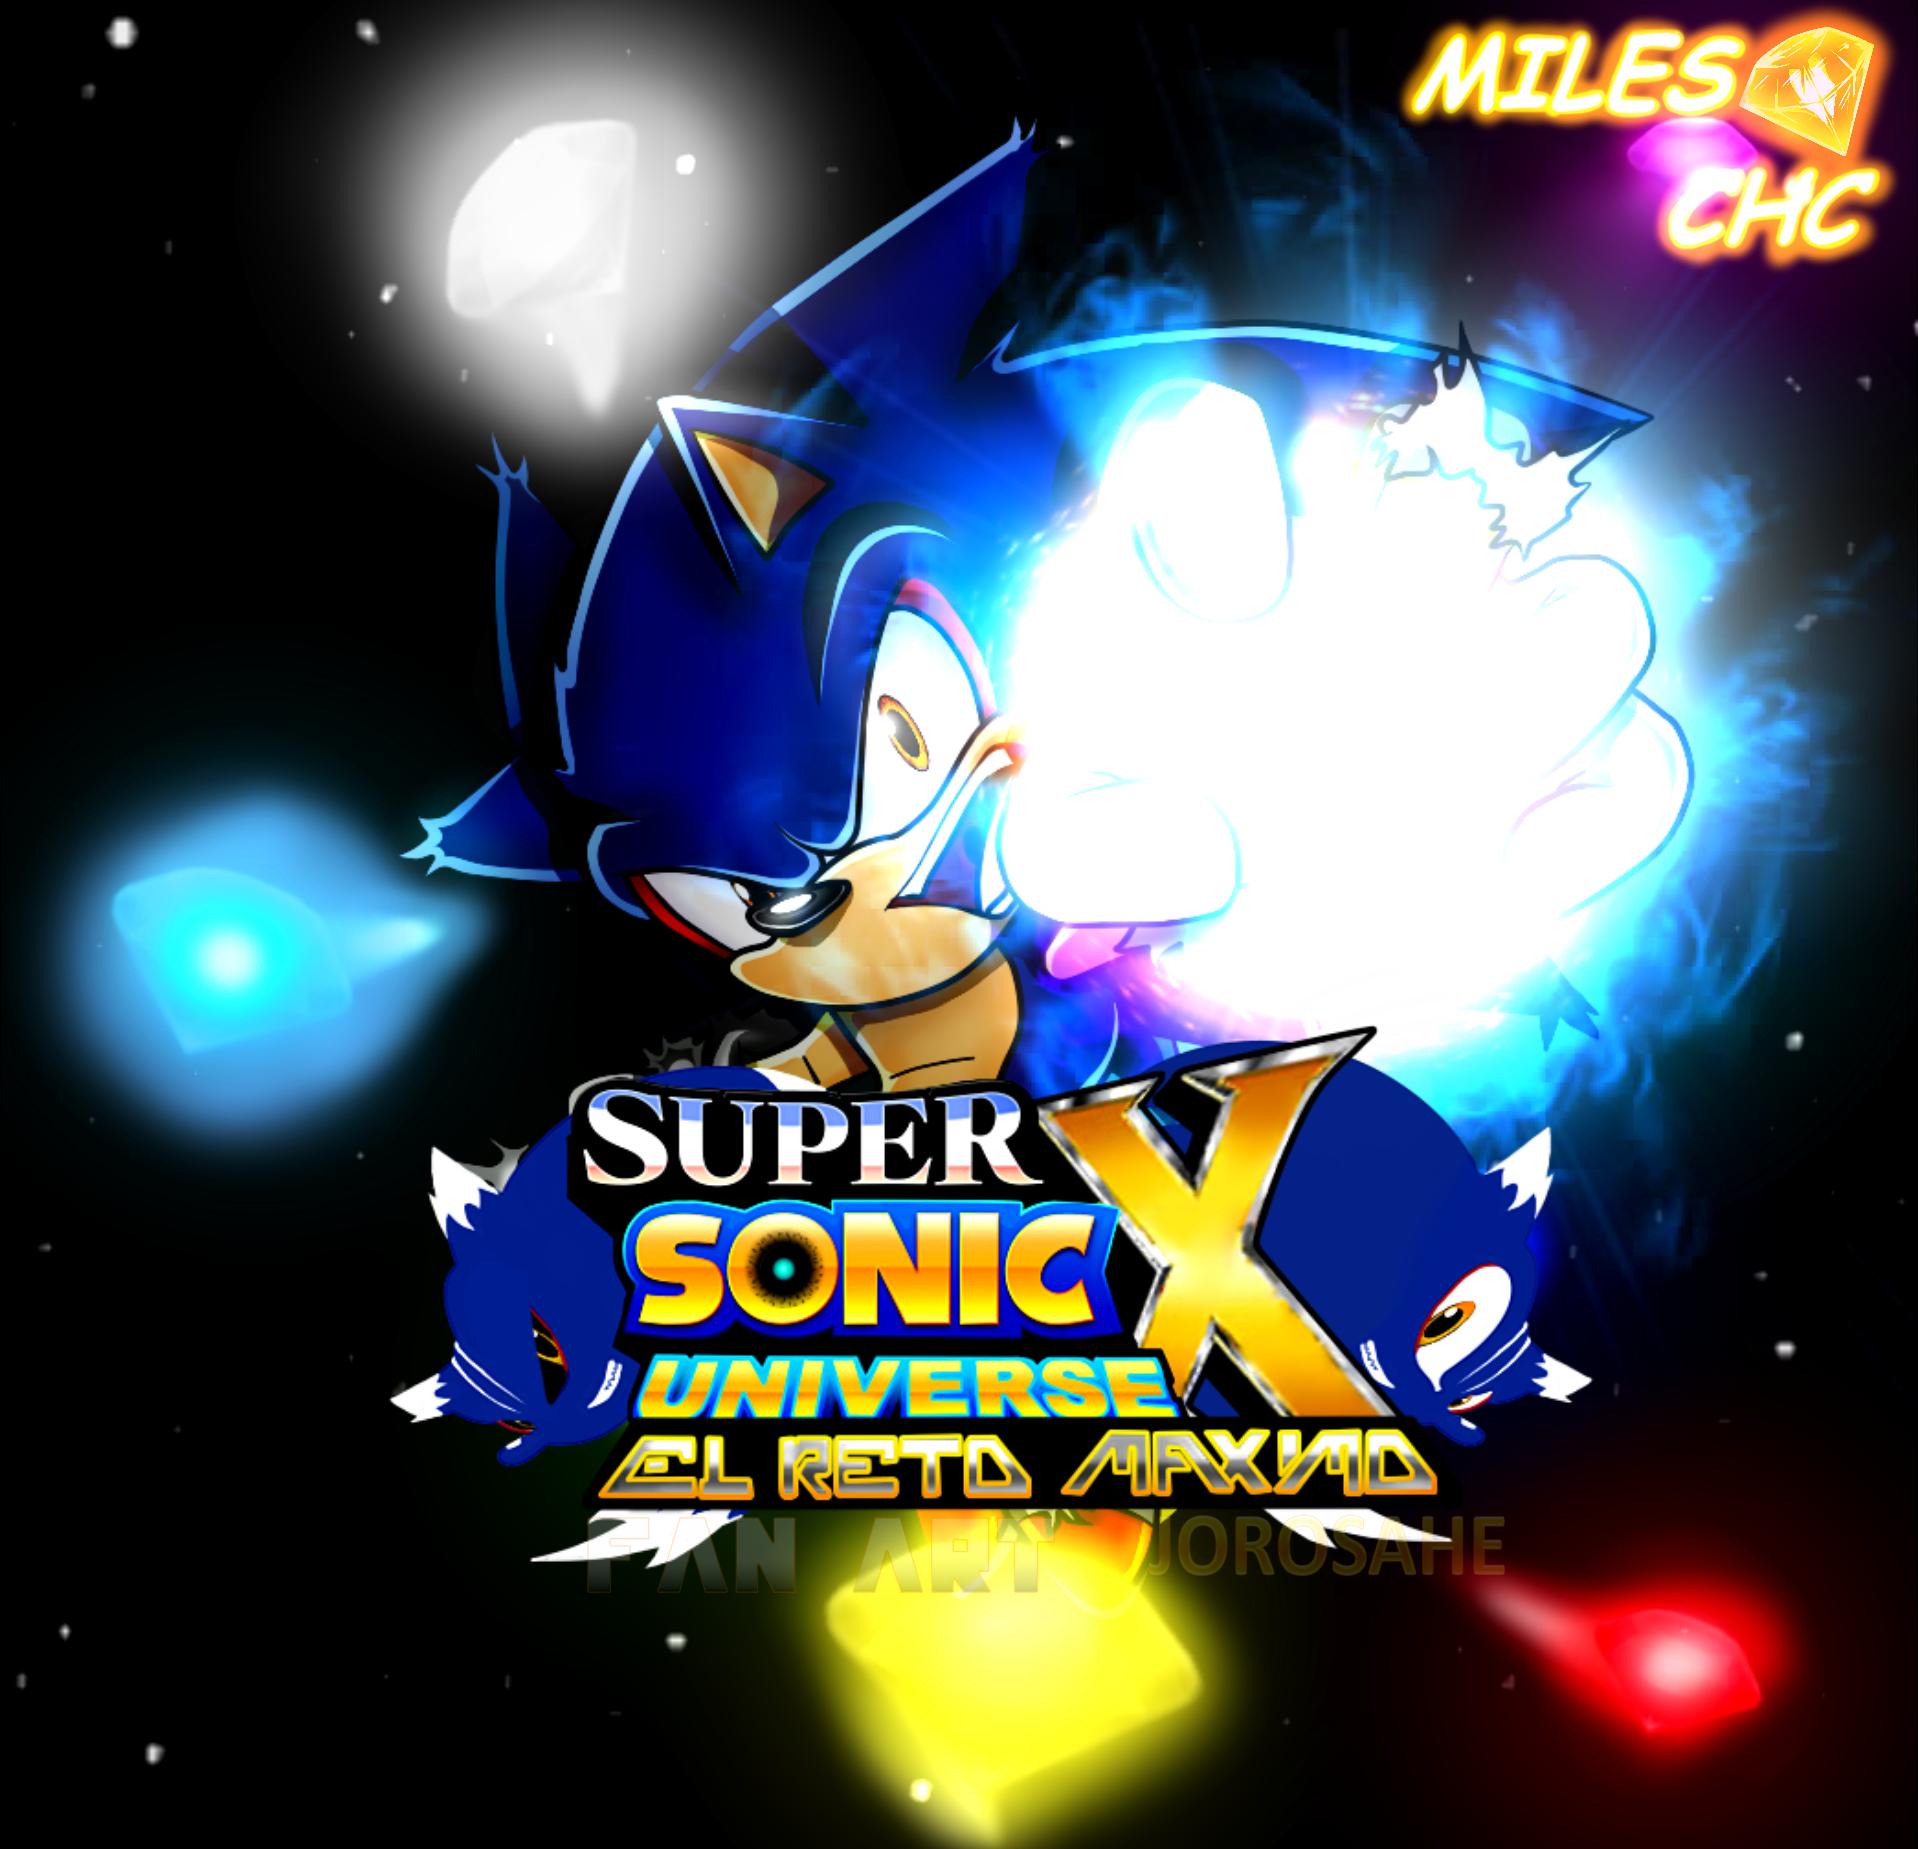 oO SUPER SONIC X UNIVERSE EL RETO MAXIMO Oo POSTER by MilesCHC on